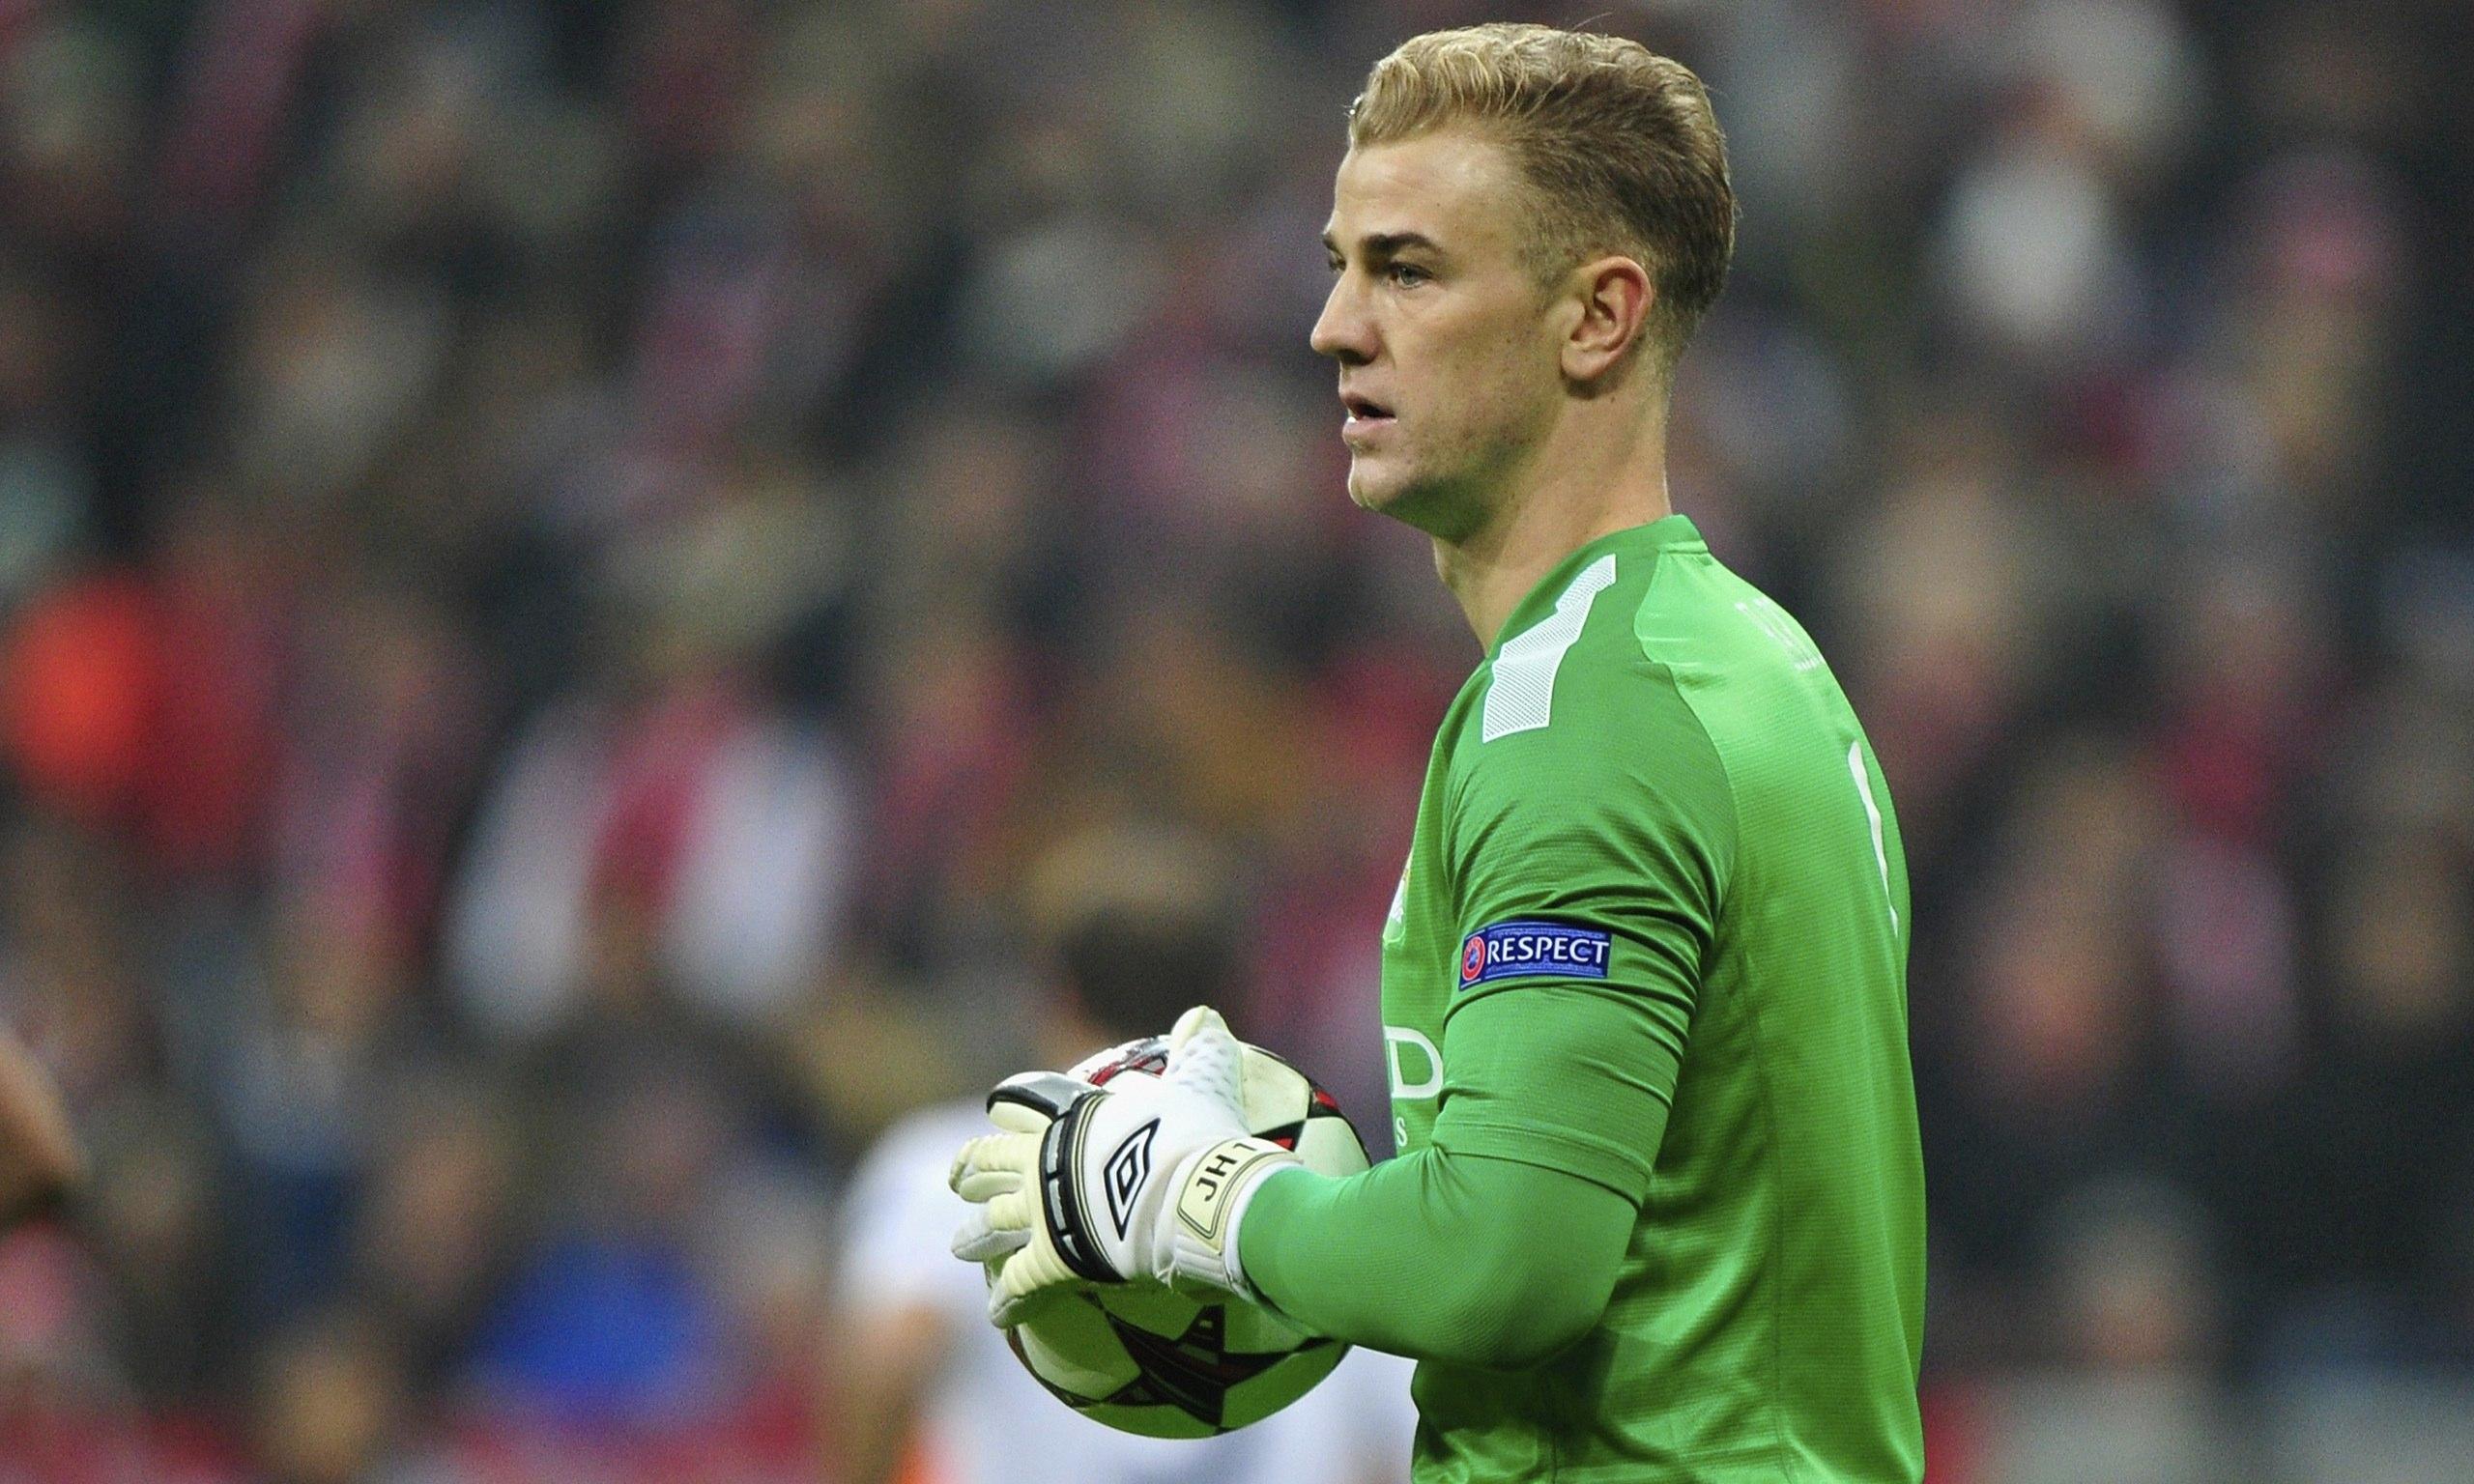 joe hart football player goalkeeper Wallpaper HD Sports 4K 2560x1536